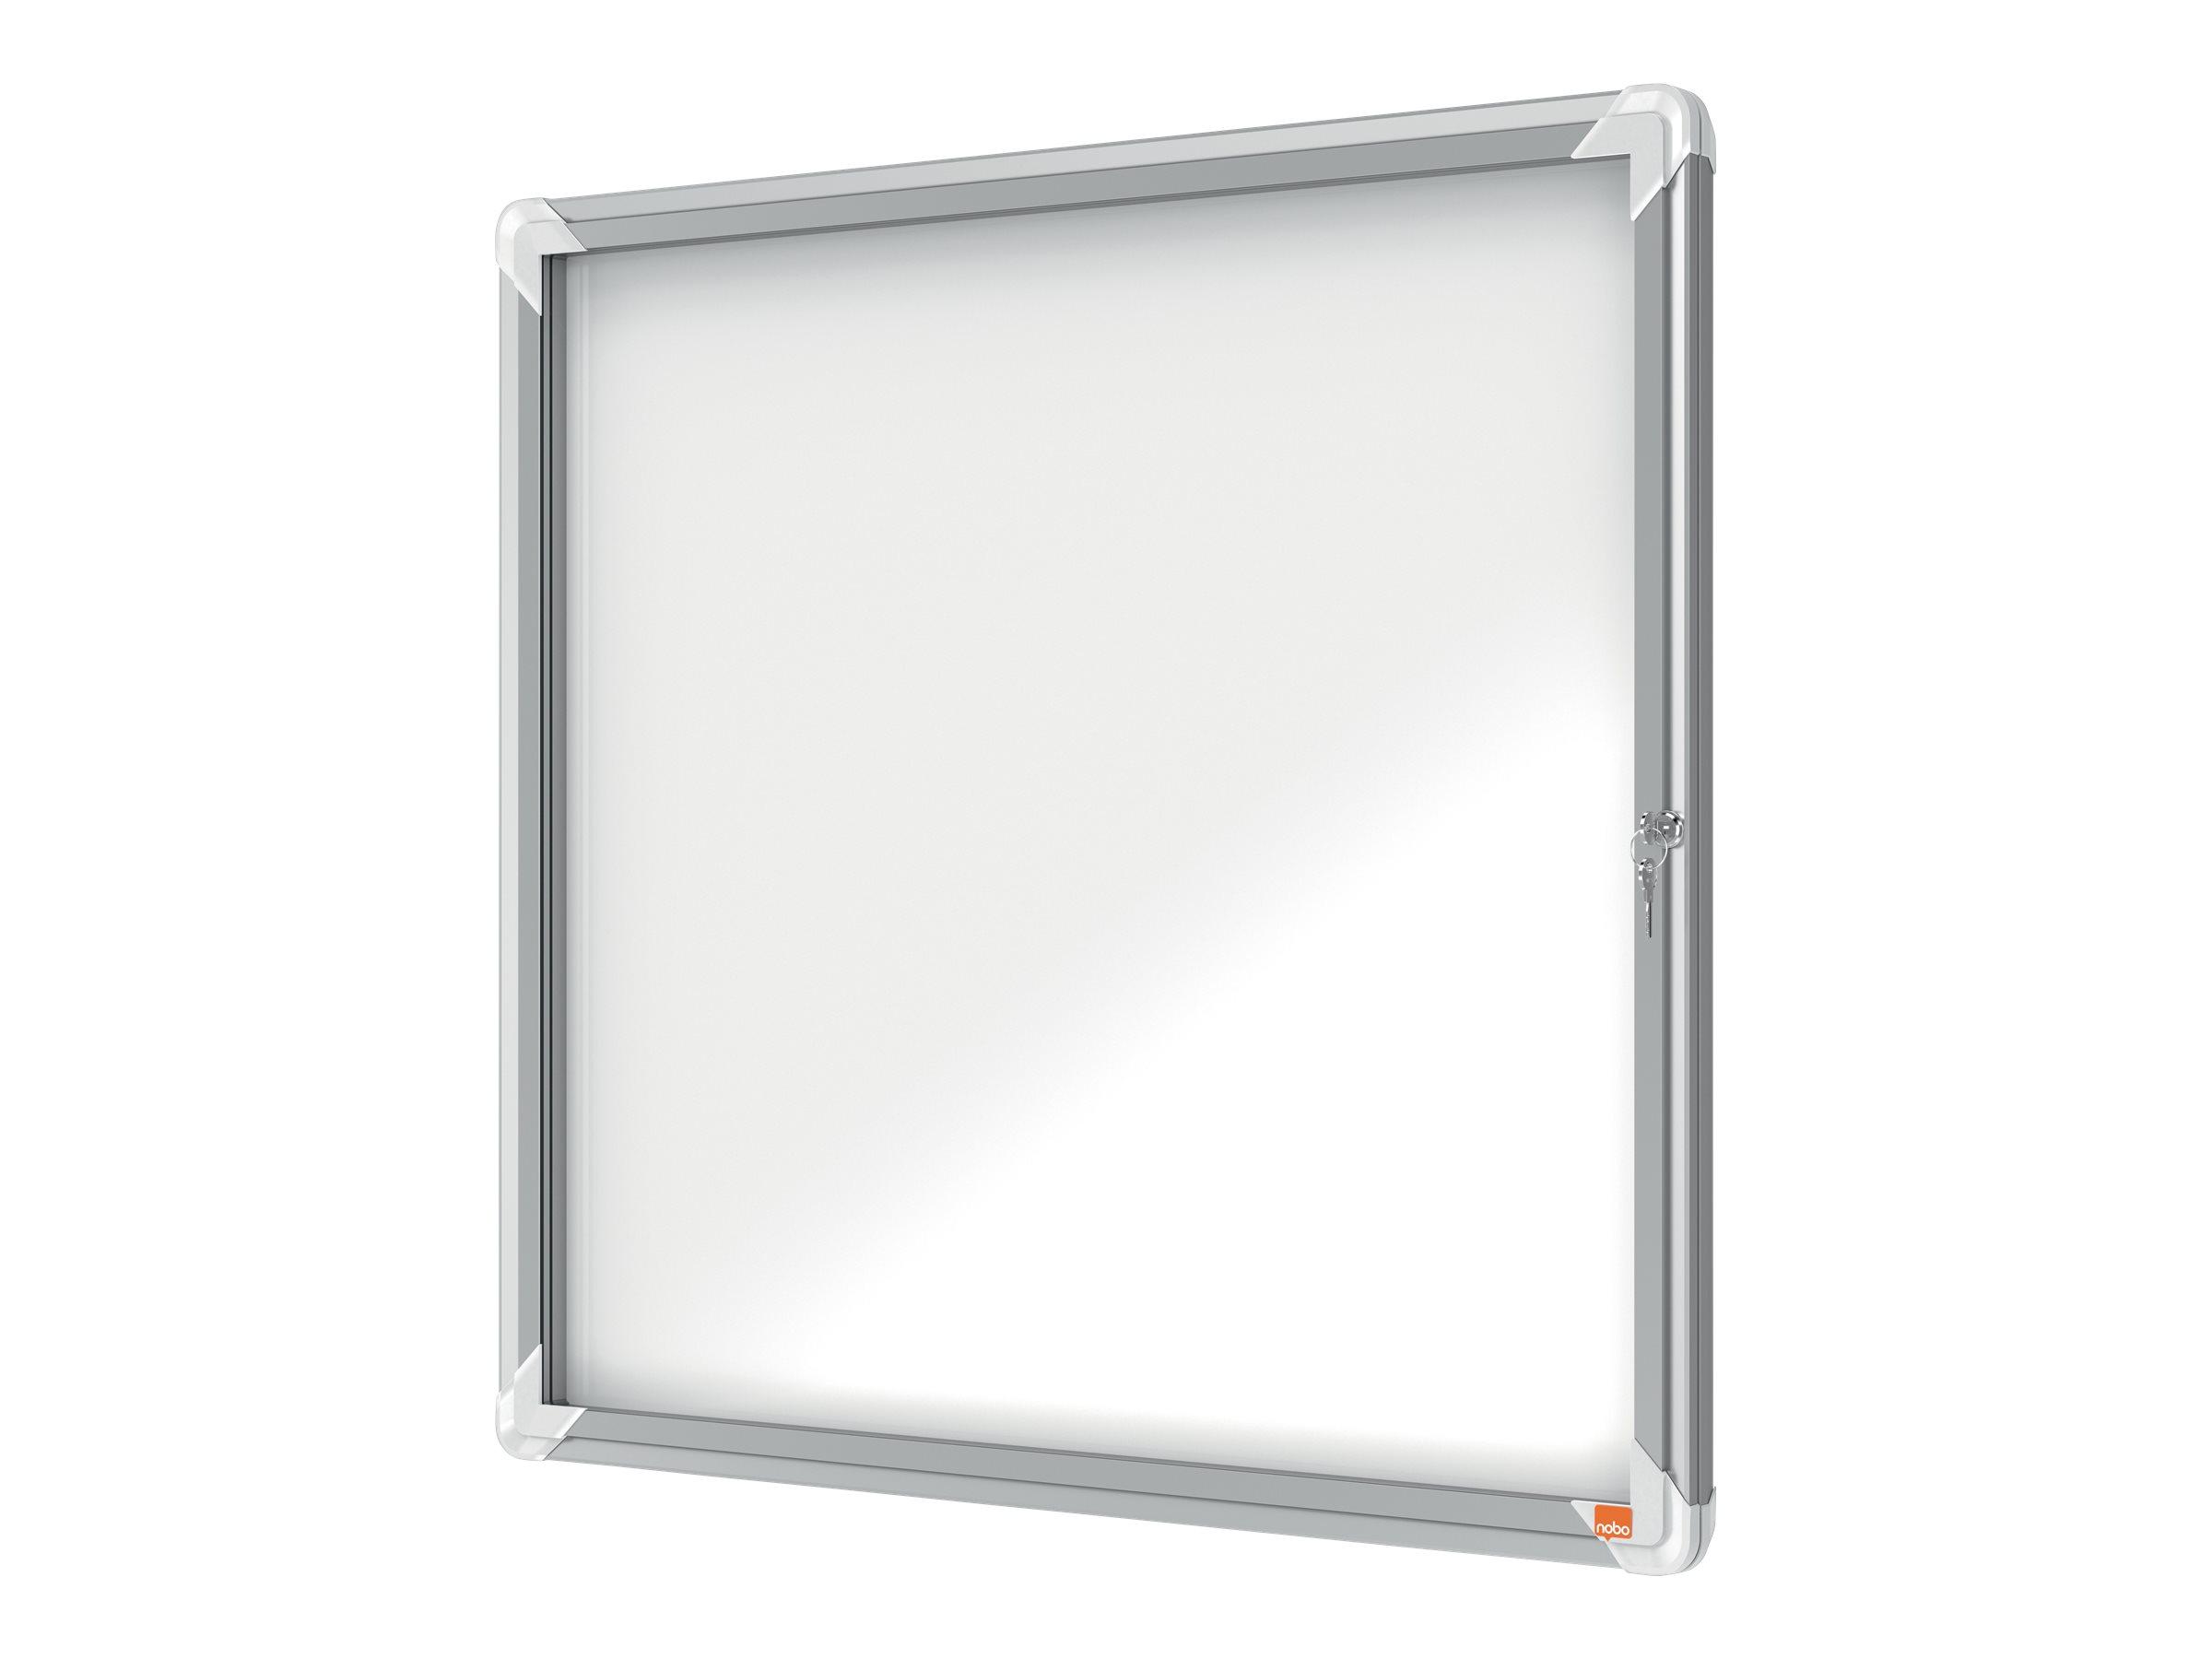 Nobo - Vitrine extérieure 6 A4 (709 x 668 mm) - cadre aluminium fond métal